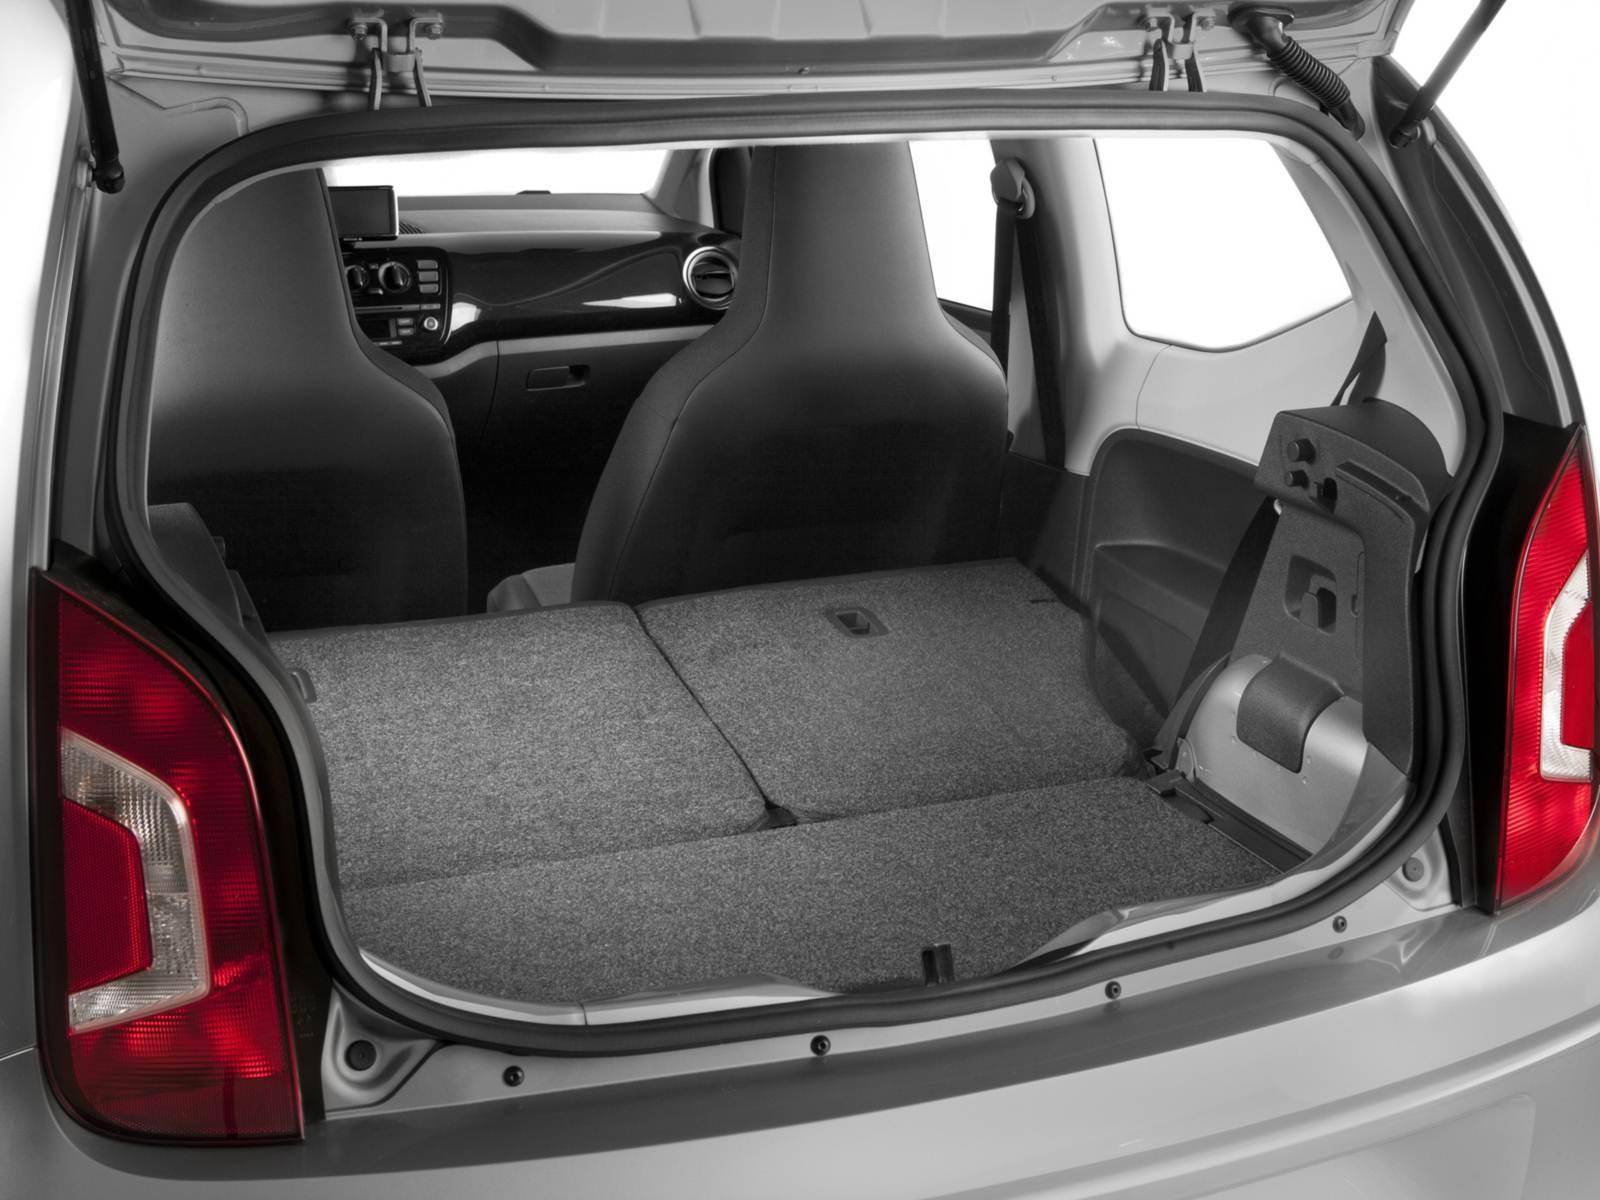 Novo Volkswagen up! 2 portas - Brasil - interior